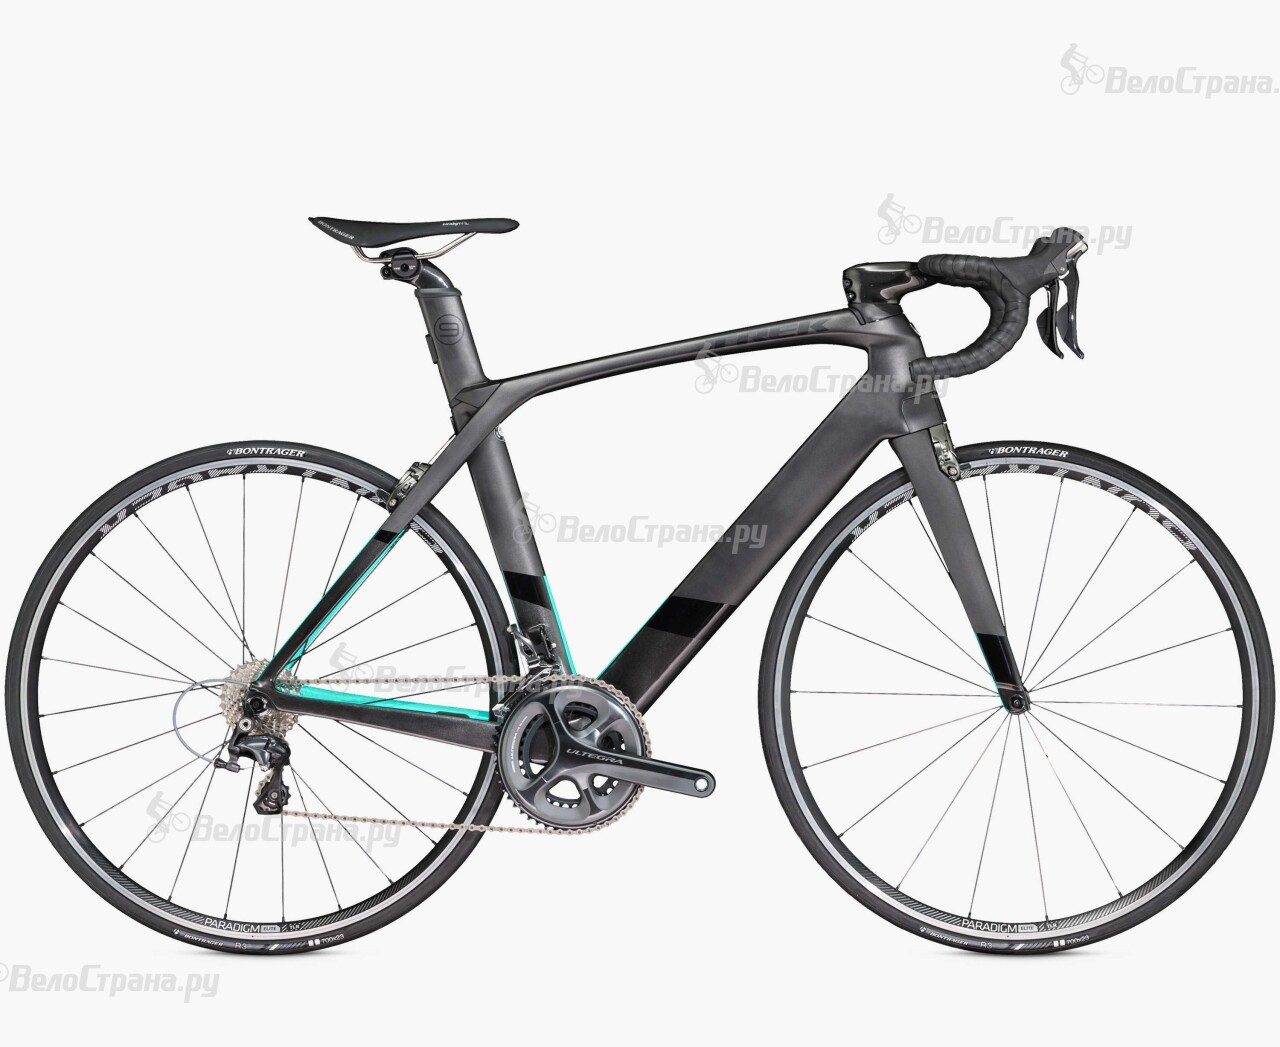 Велосипед Trek Madone 9.2 (2016) велосипед trek madone 7 9 2015